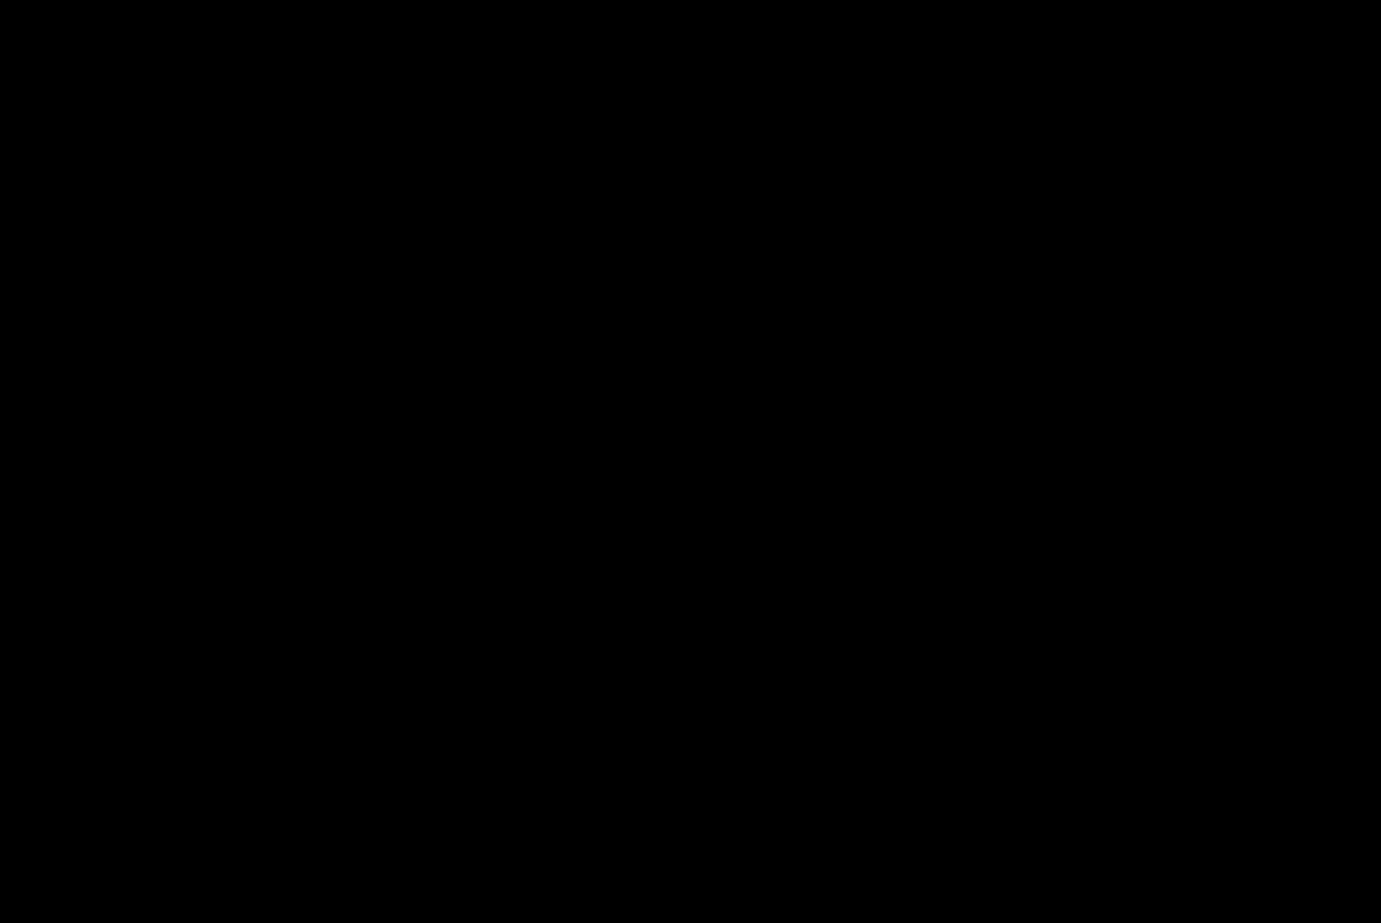 Amino-dPEG®₁₂-Tris (m-dPEG®₂₄)₃